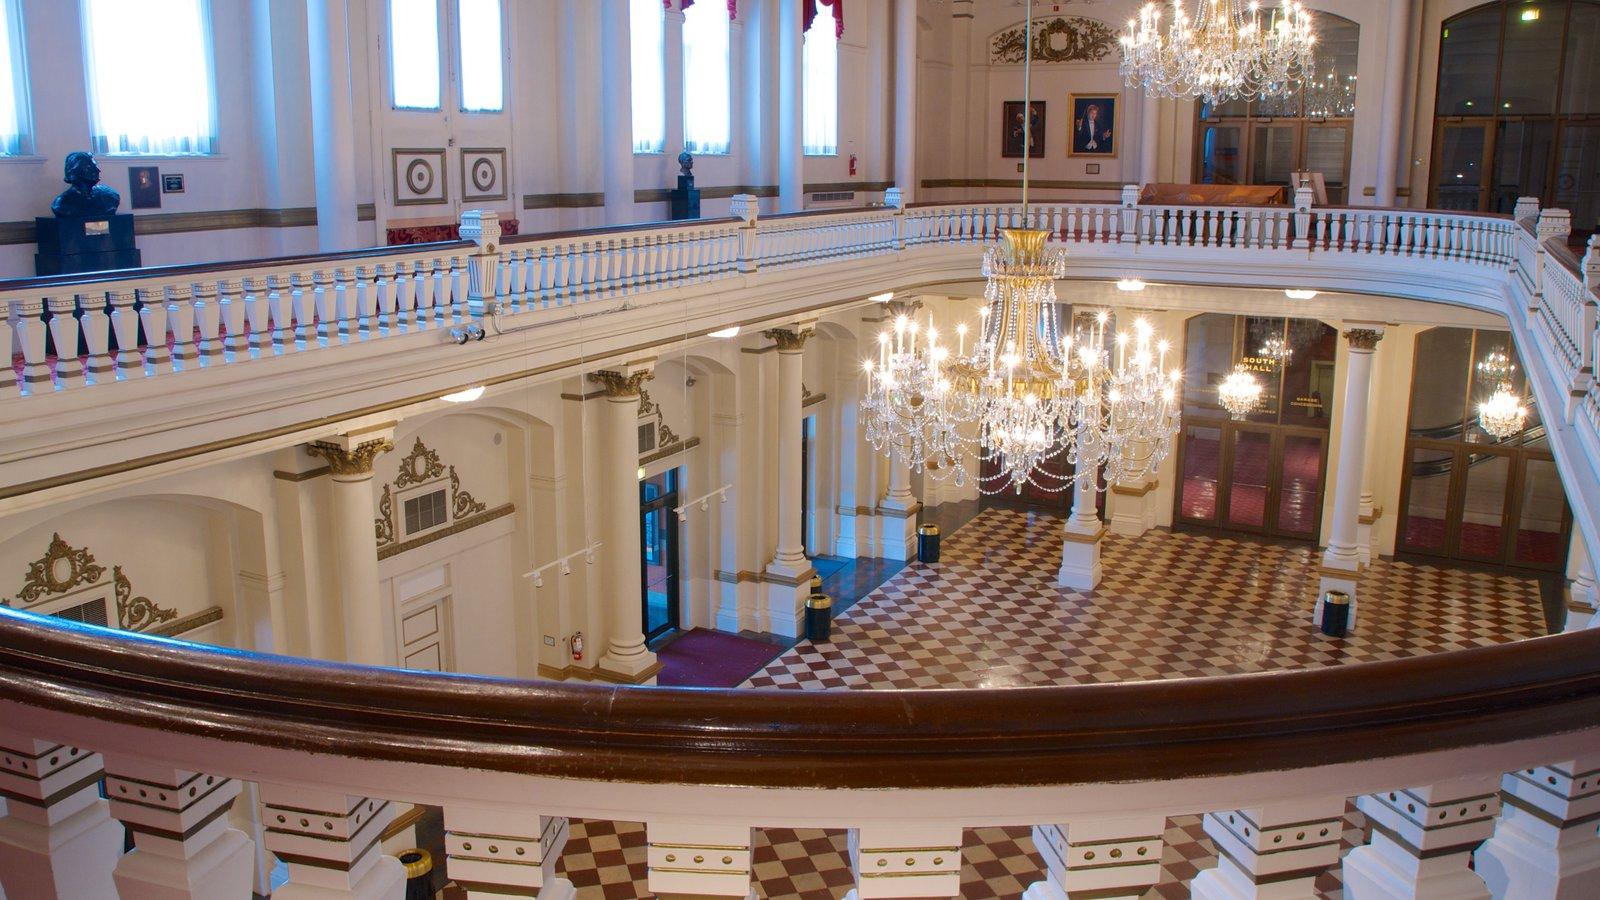 Cincinnati Music Hall que inclui arquitetura de patrimônio e vistas internas